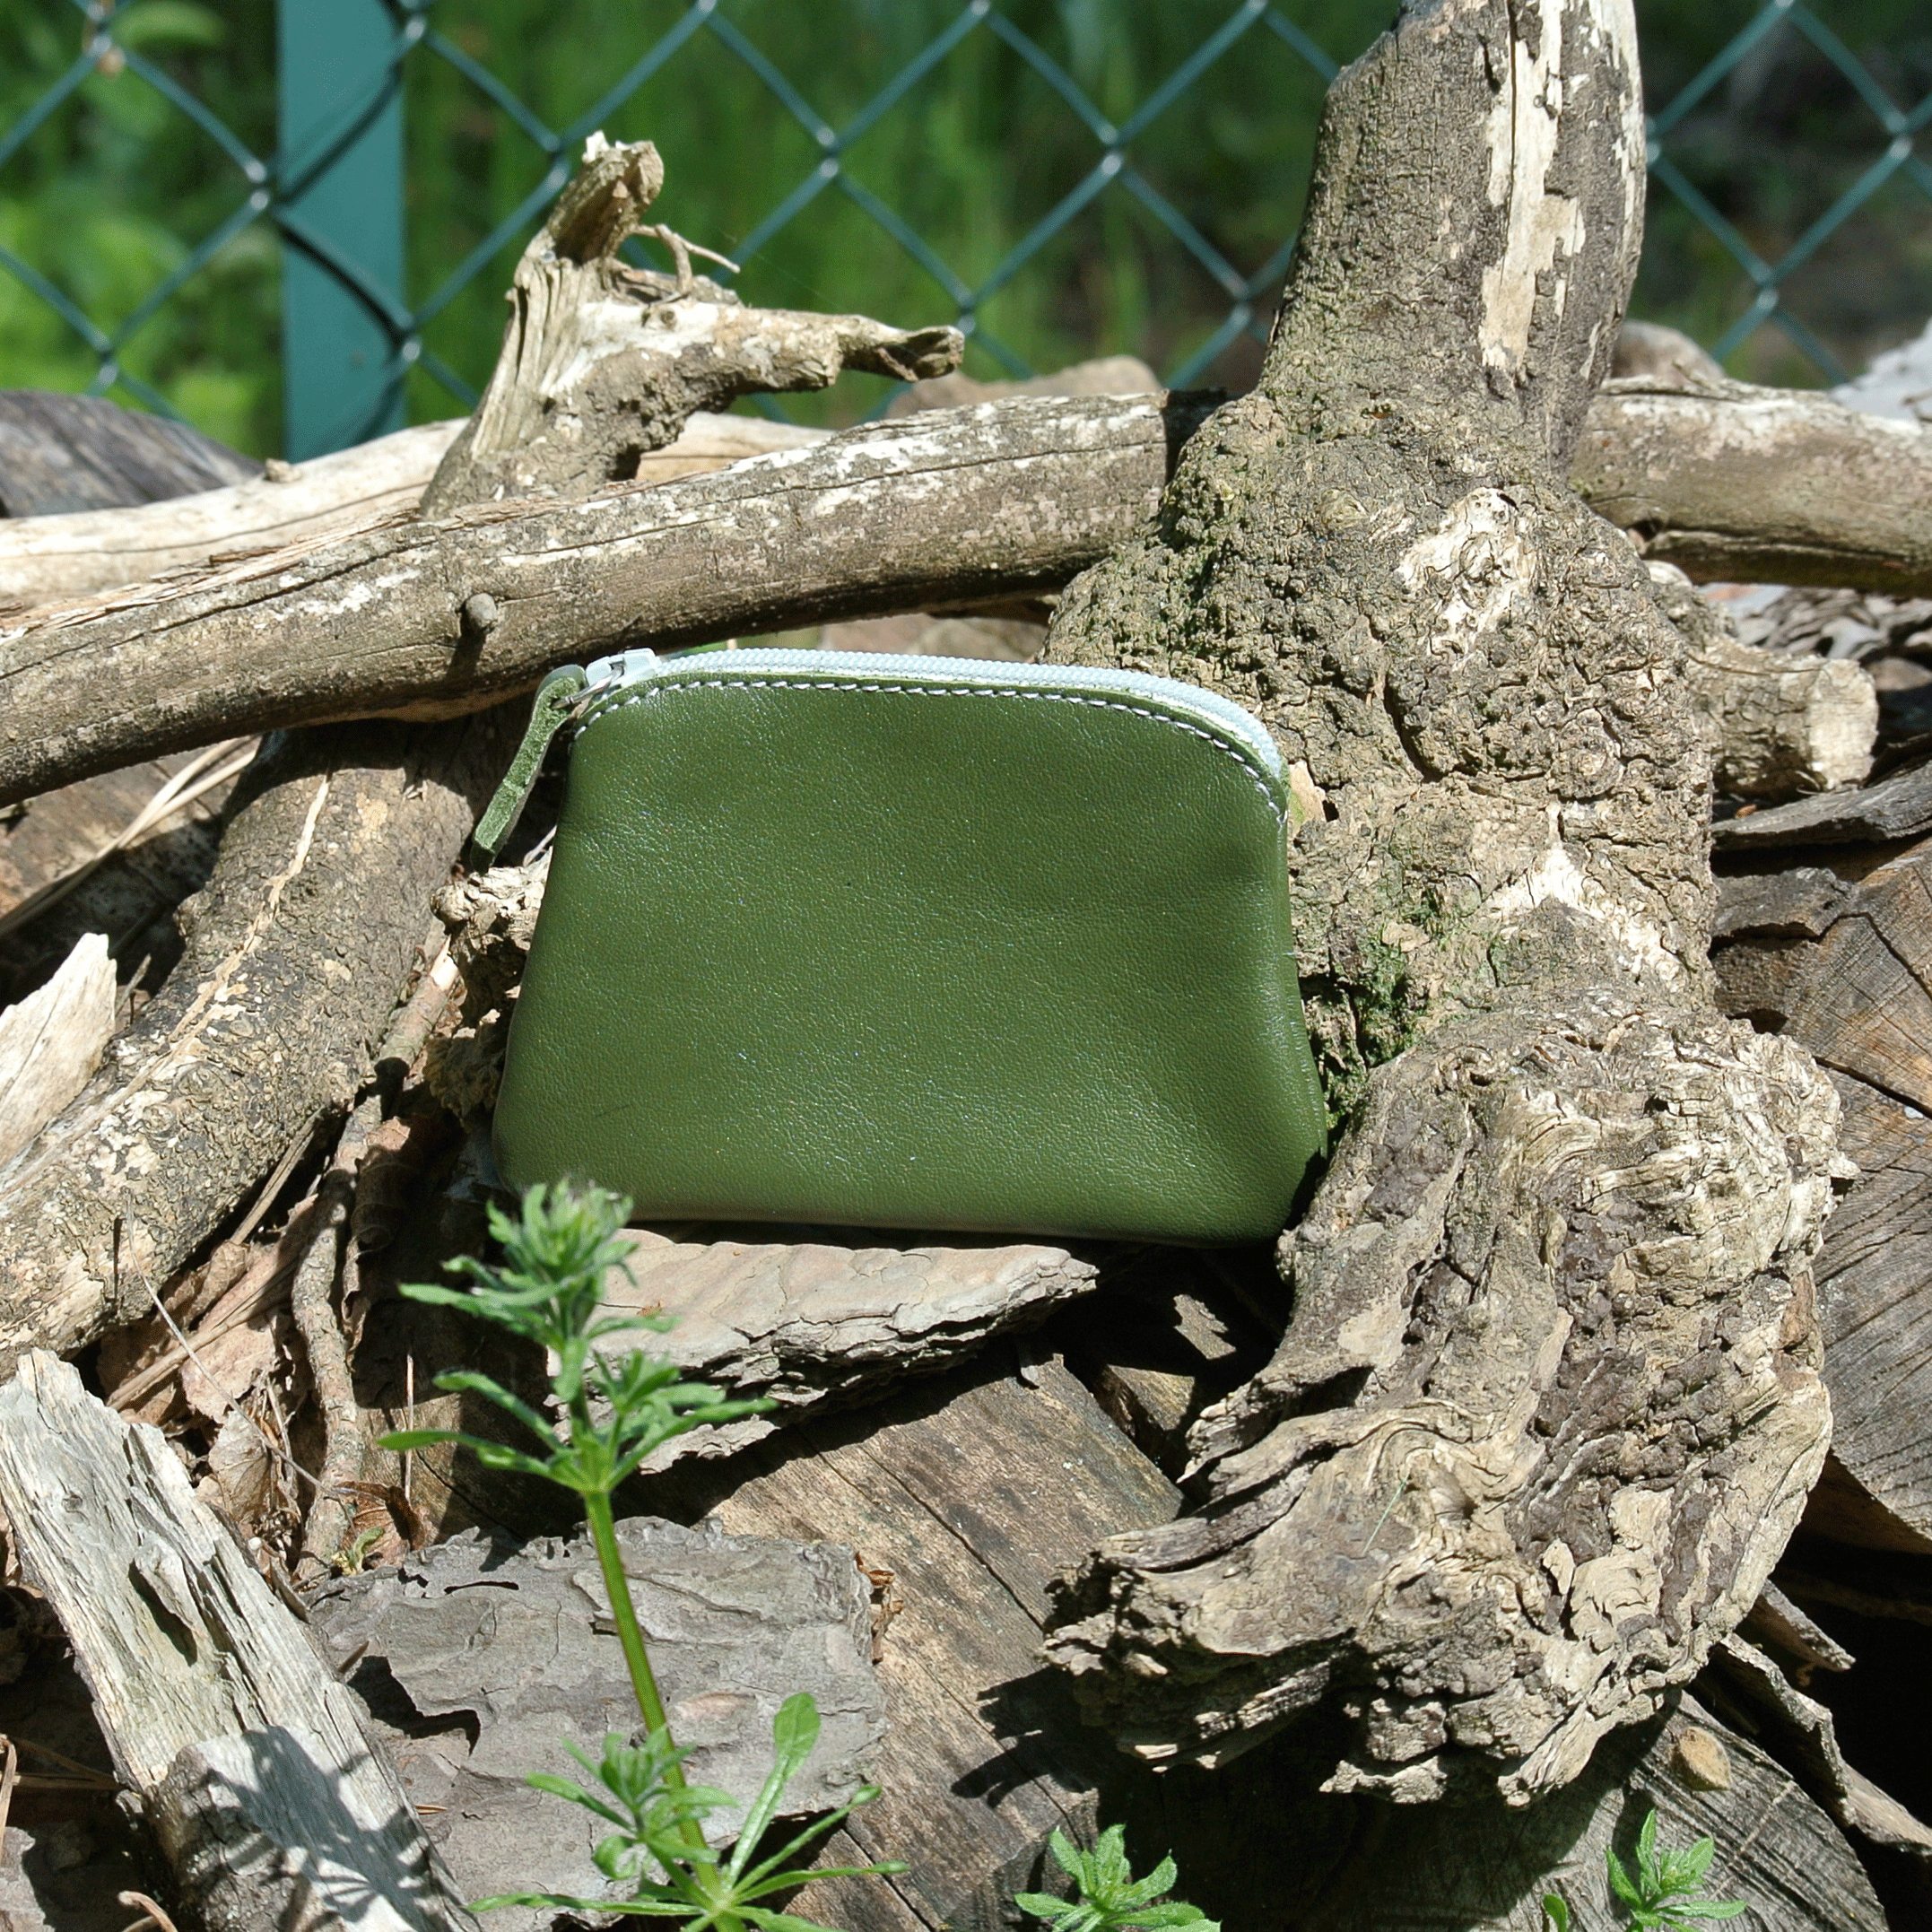 cuirs-fantaisies-la-cartabliere-fabrique-en-france-porte-monnaie-kiwi-en-cuir-nappa-vert